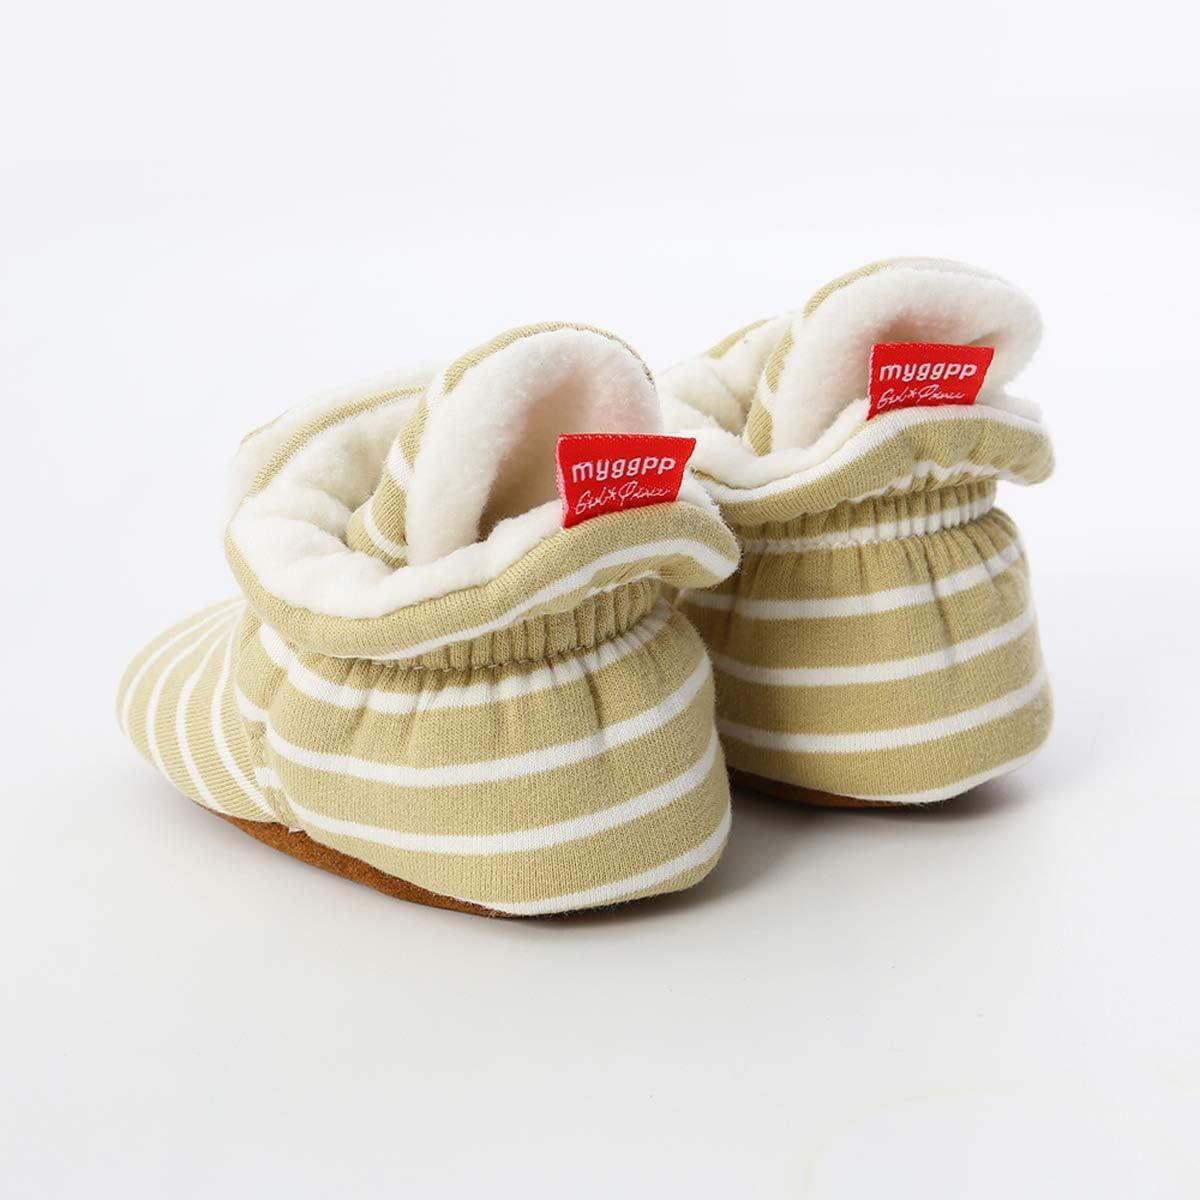 Tutoo Infant Baby Boy Girl Cozy Fleece Bootie Newborn Stay On Slipper Sock Soft Sole Gripper Non-Skid Crib Shoe First Birthday Shower Gift